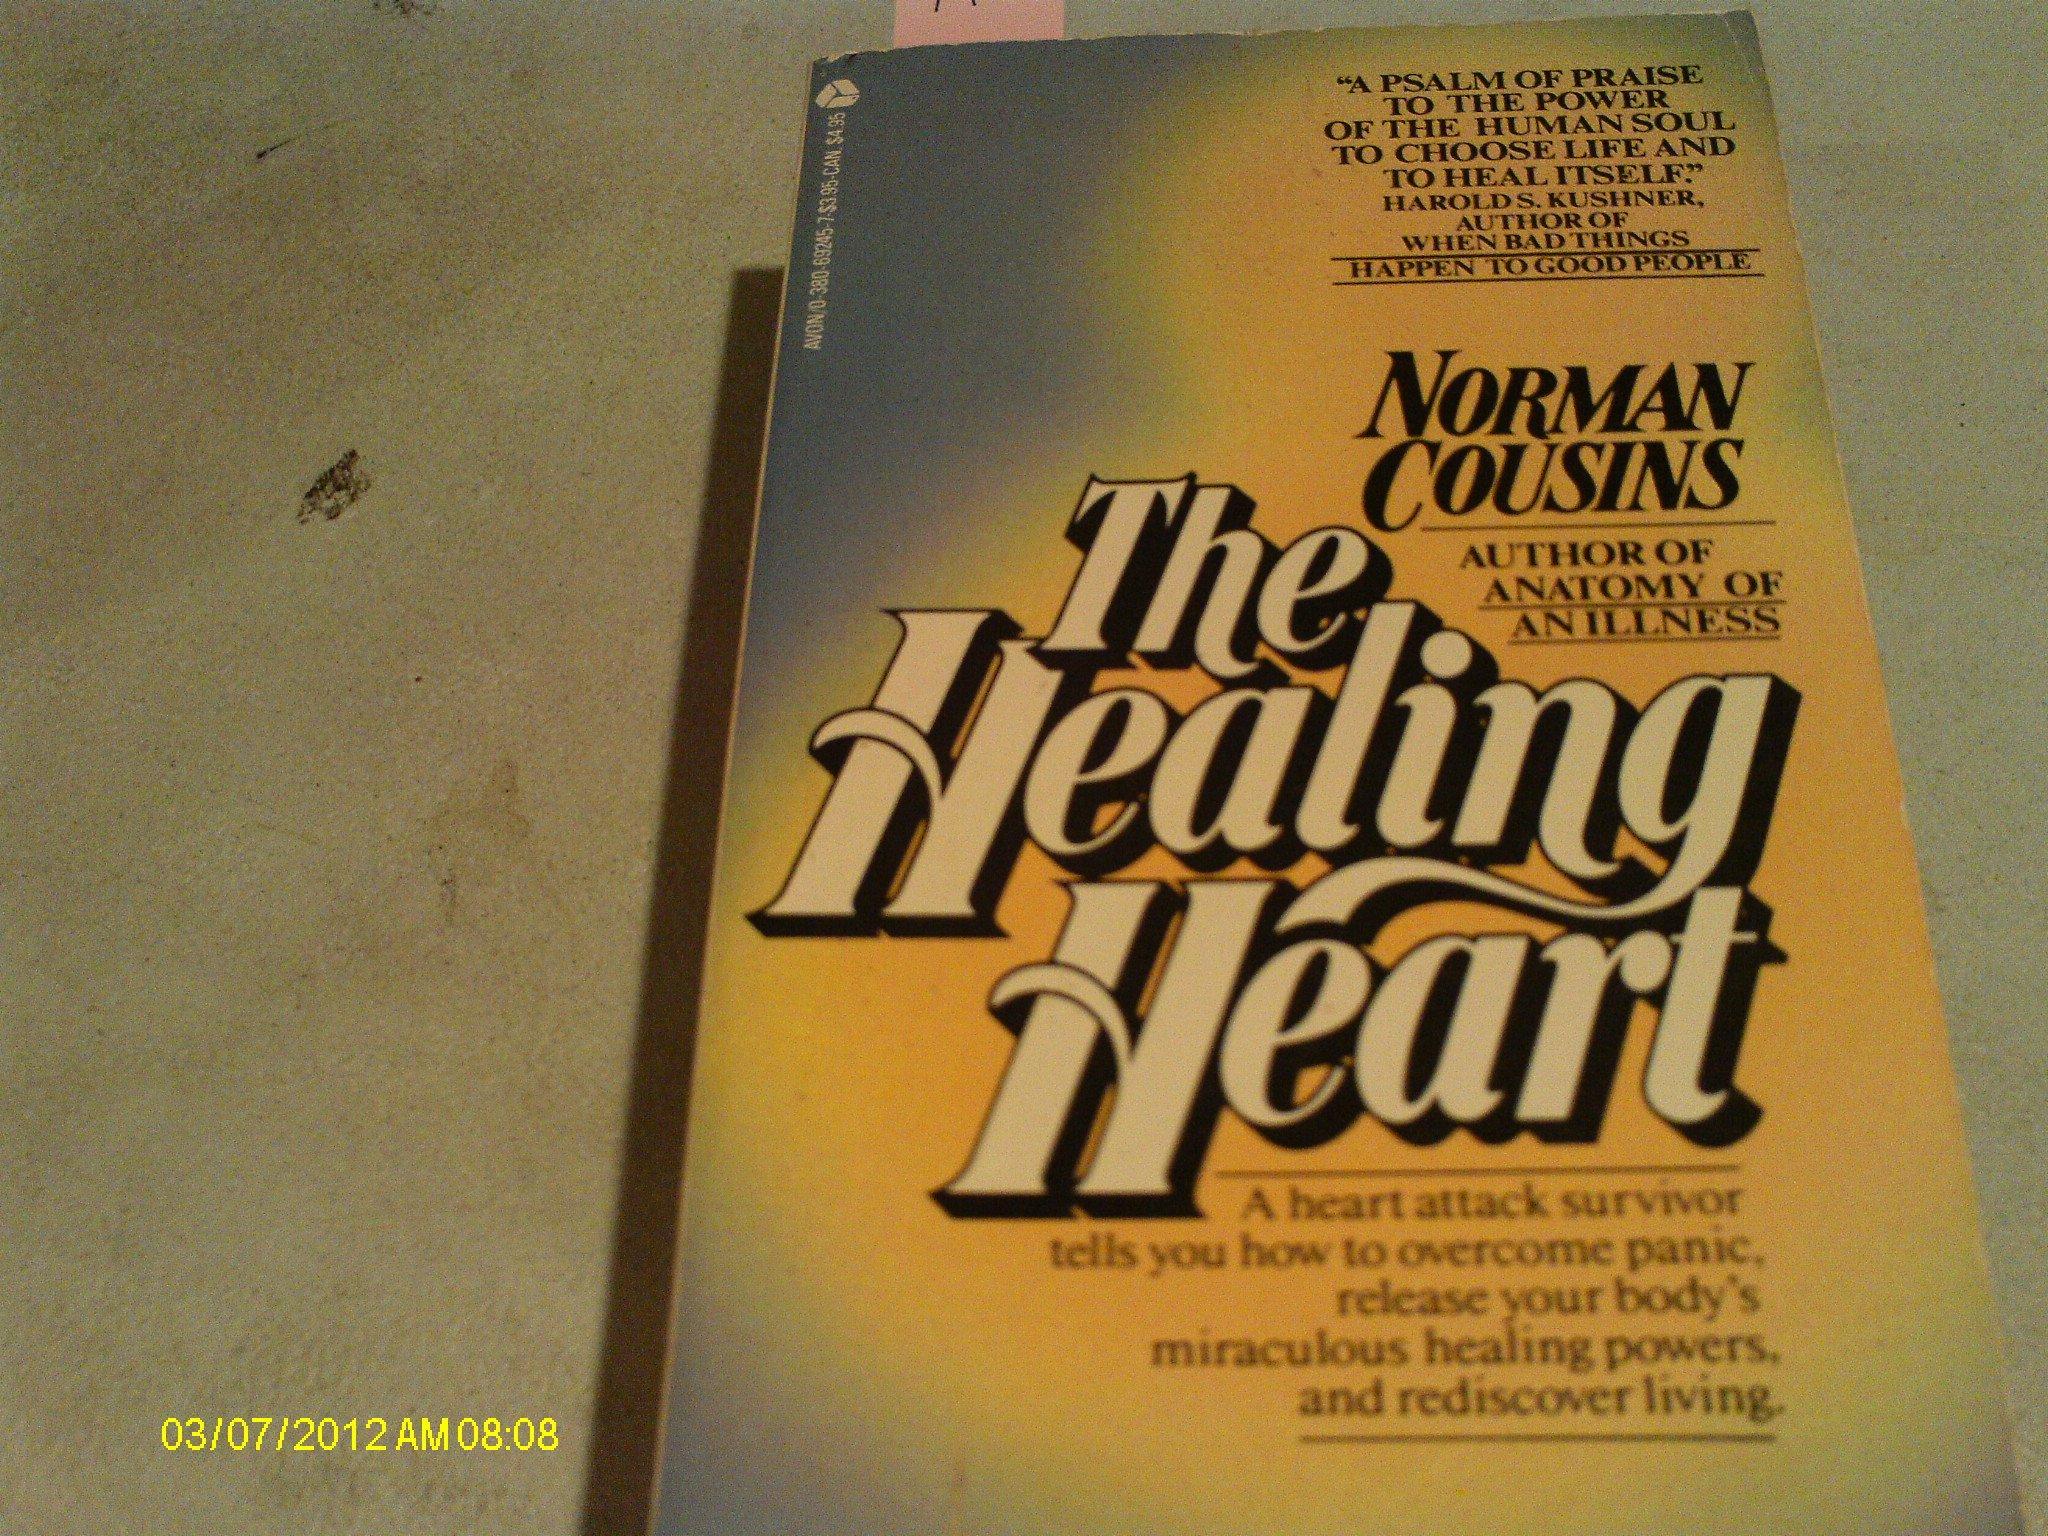 Healing Heart Norman Cousins 9780380692453 Amazon Books